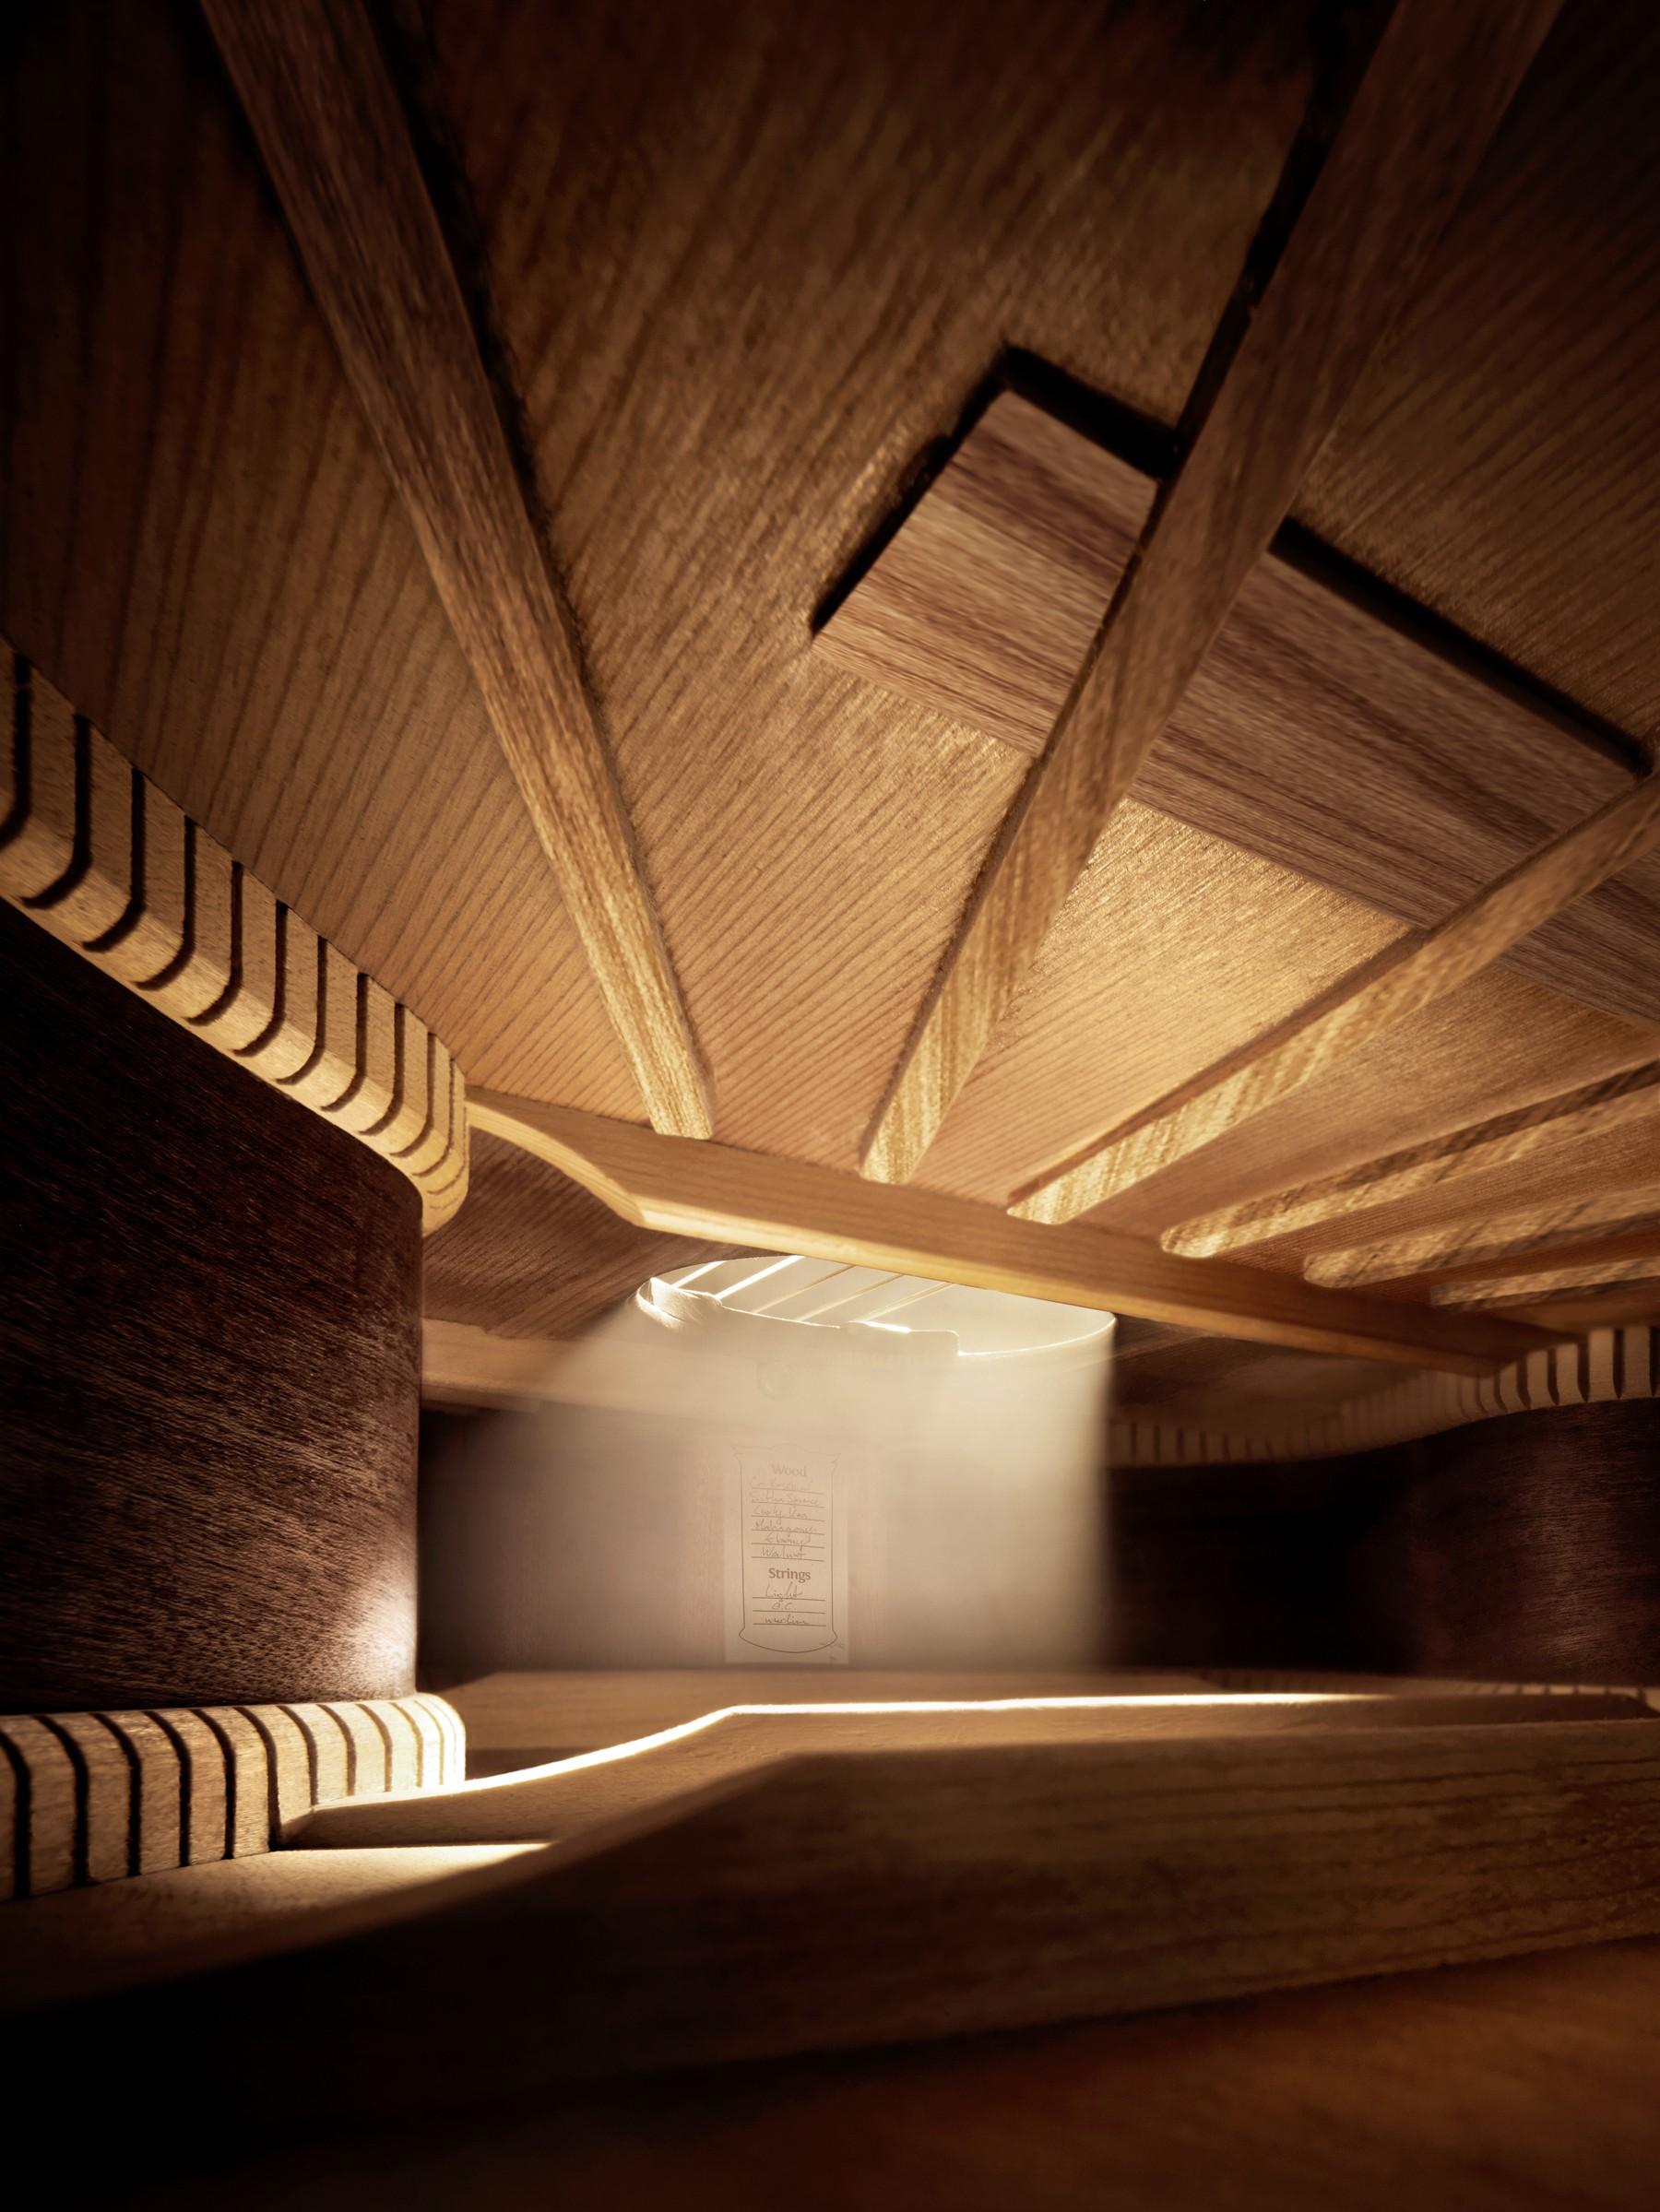 inside-the-music-print-campaign-by-mierswa-kluska-gessato-gblog-2